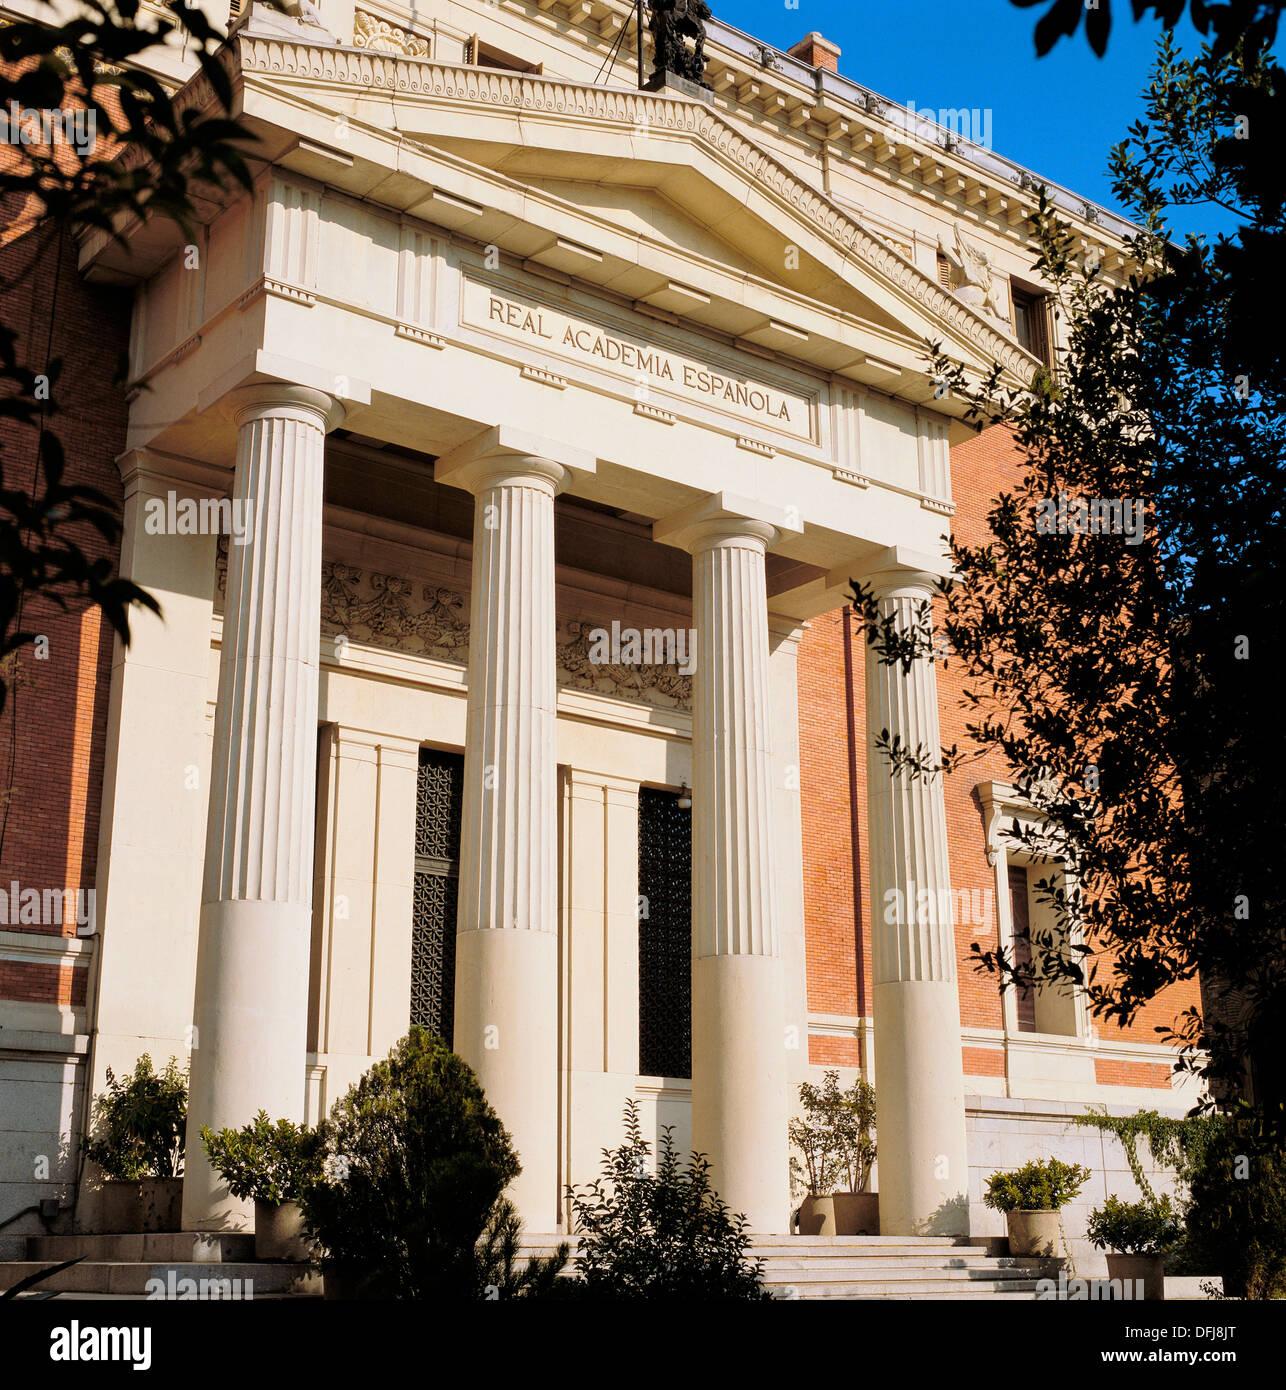 Real Academia Española de la Lengua (Royal Spanish Academy), Madrid. Spain - Stock Image